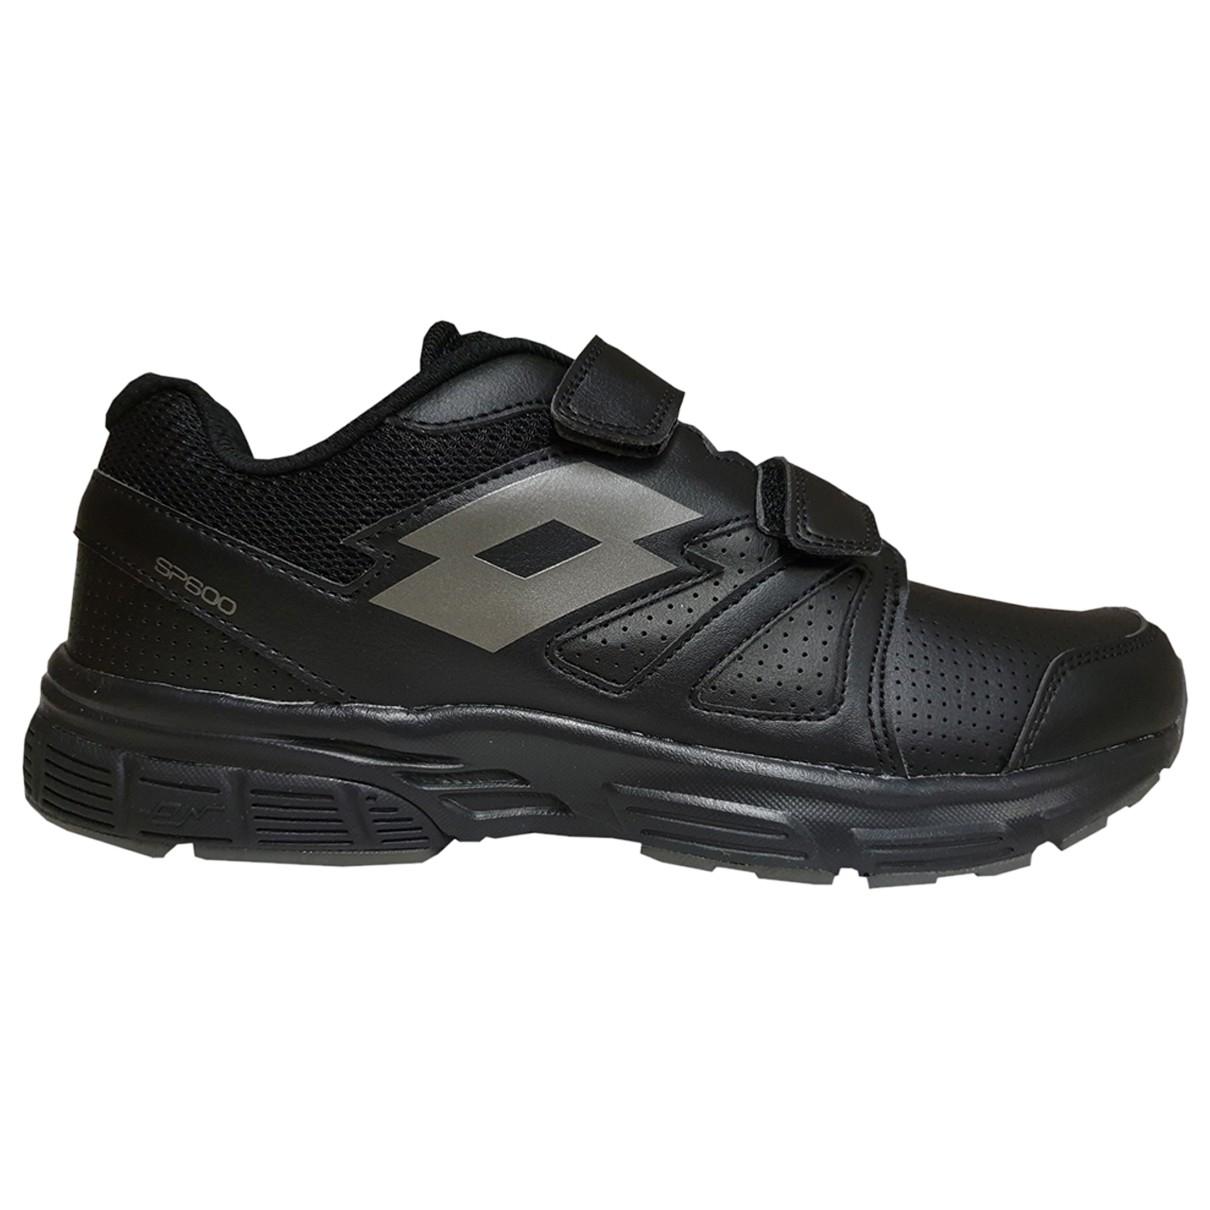 Lotto \N Sneakers in  Schwarz Leder